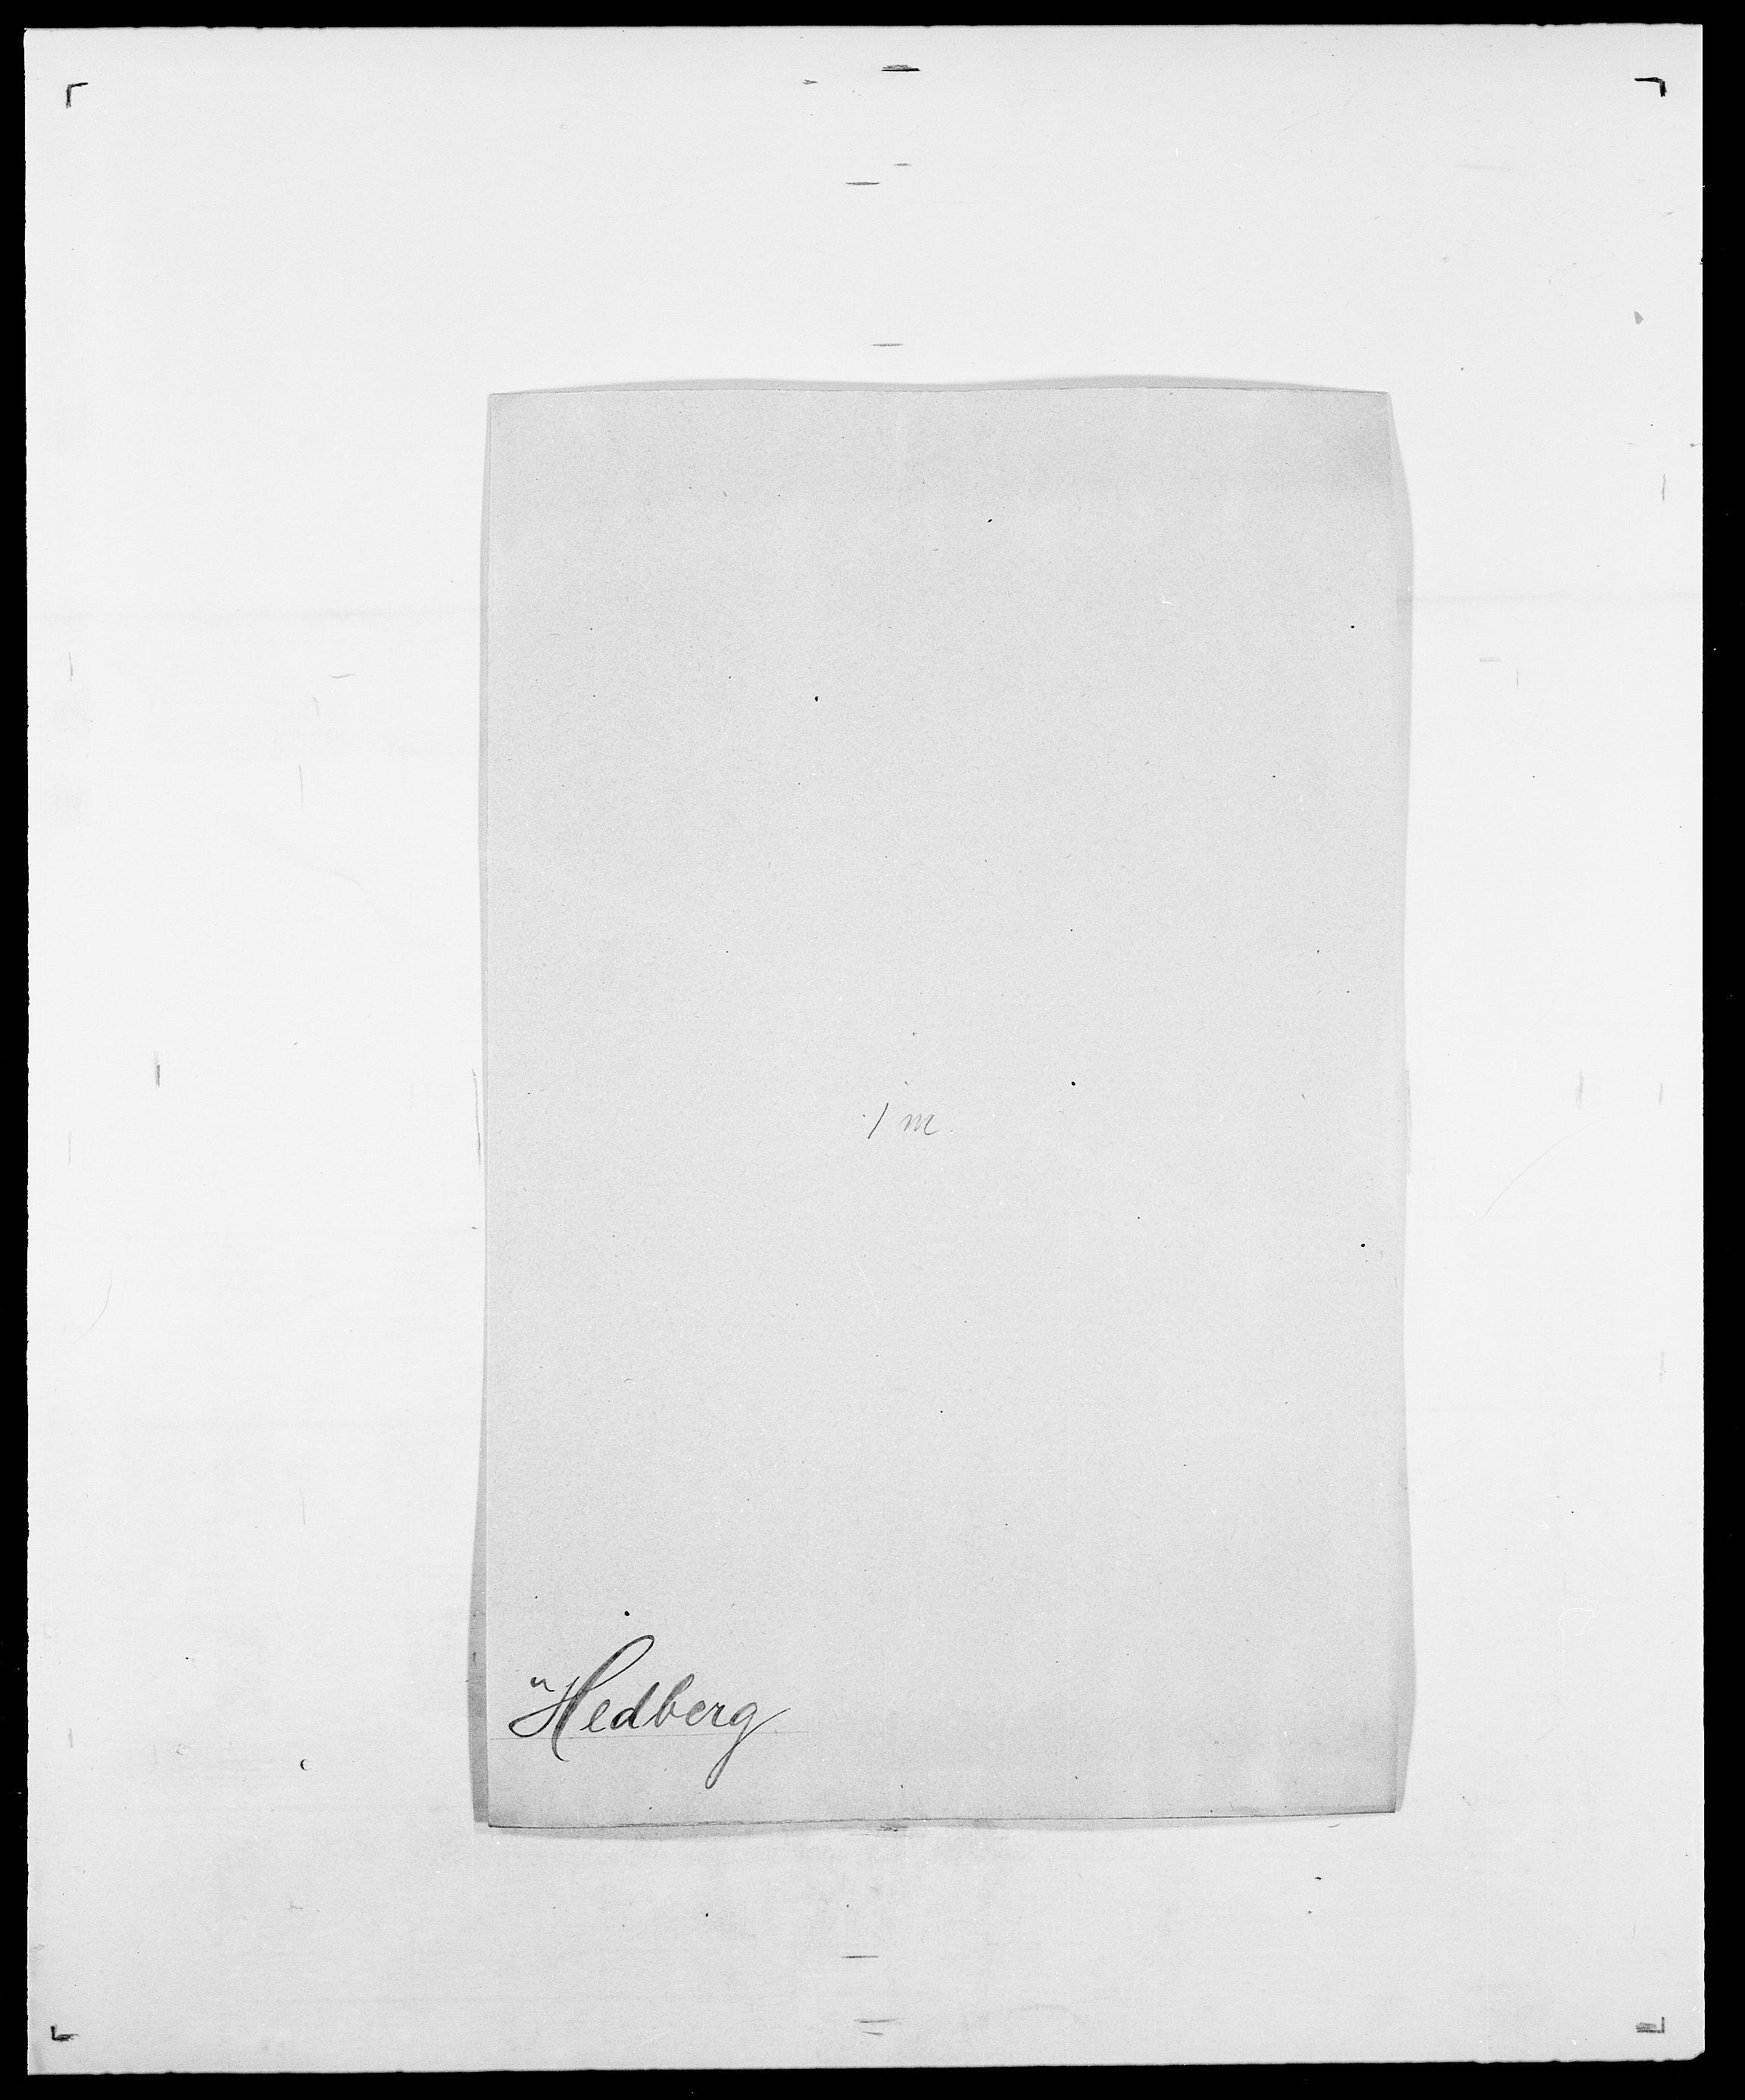 SAO, Delgobe, Charles Antoine - samling, D/Da/L0016: Hamborg - Hektoen, s. 662